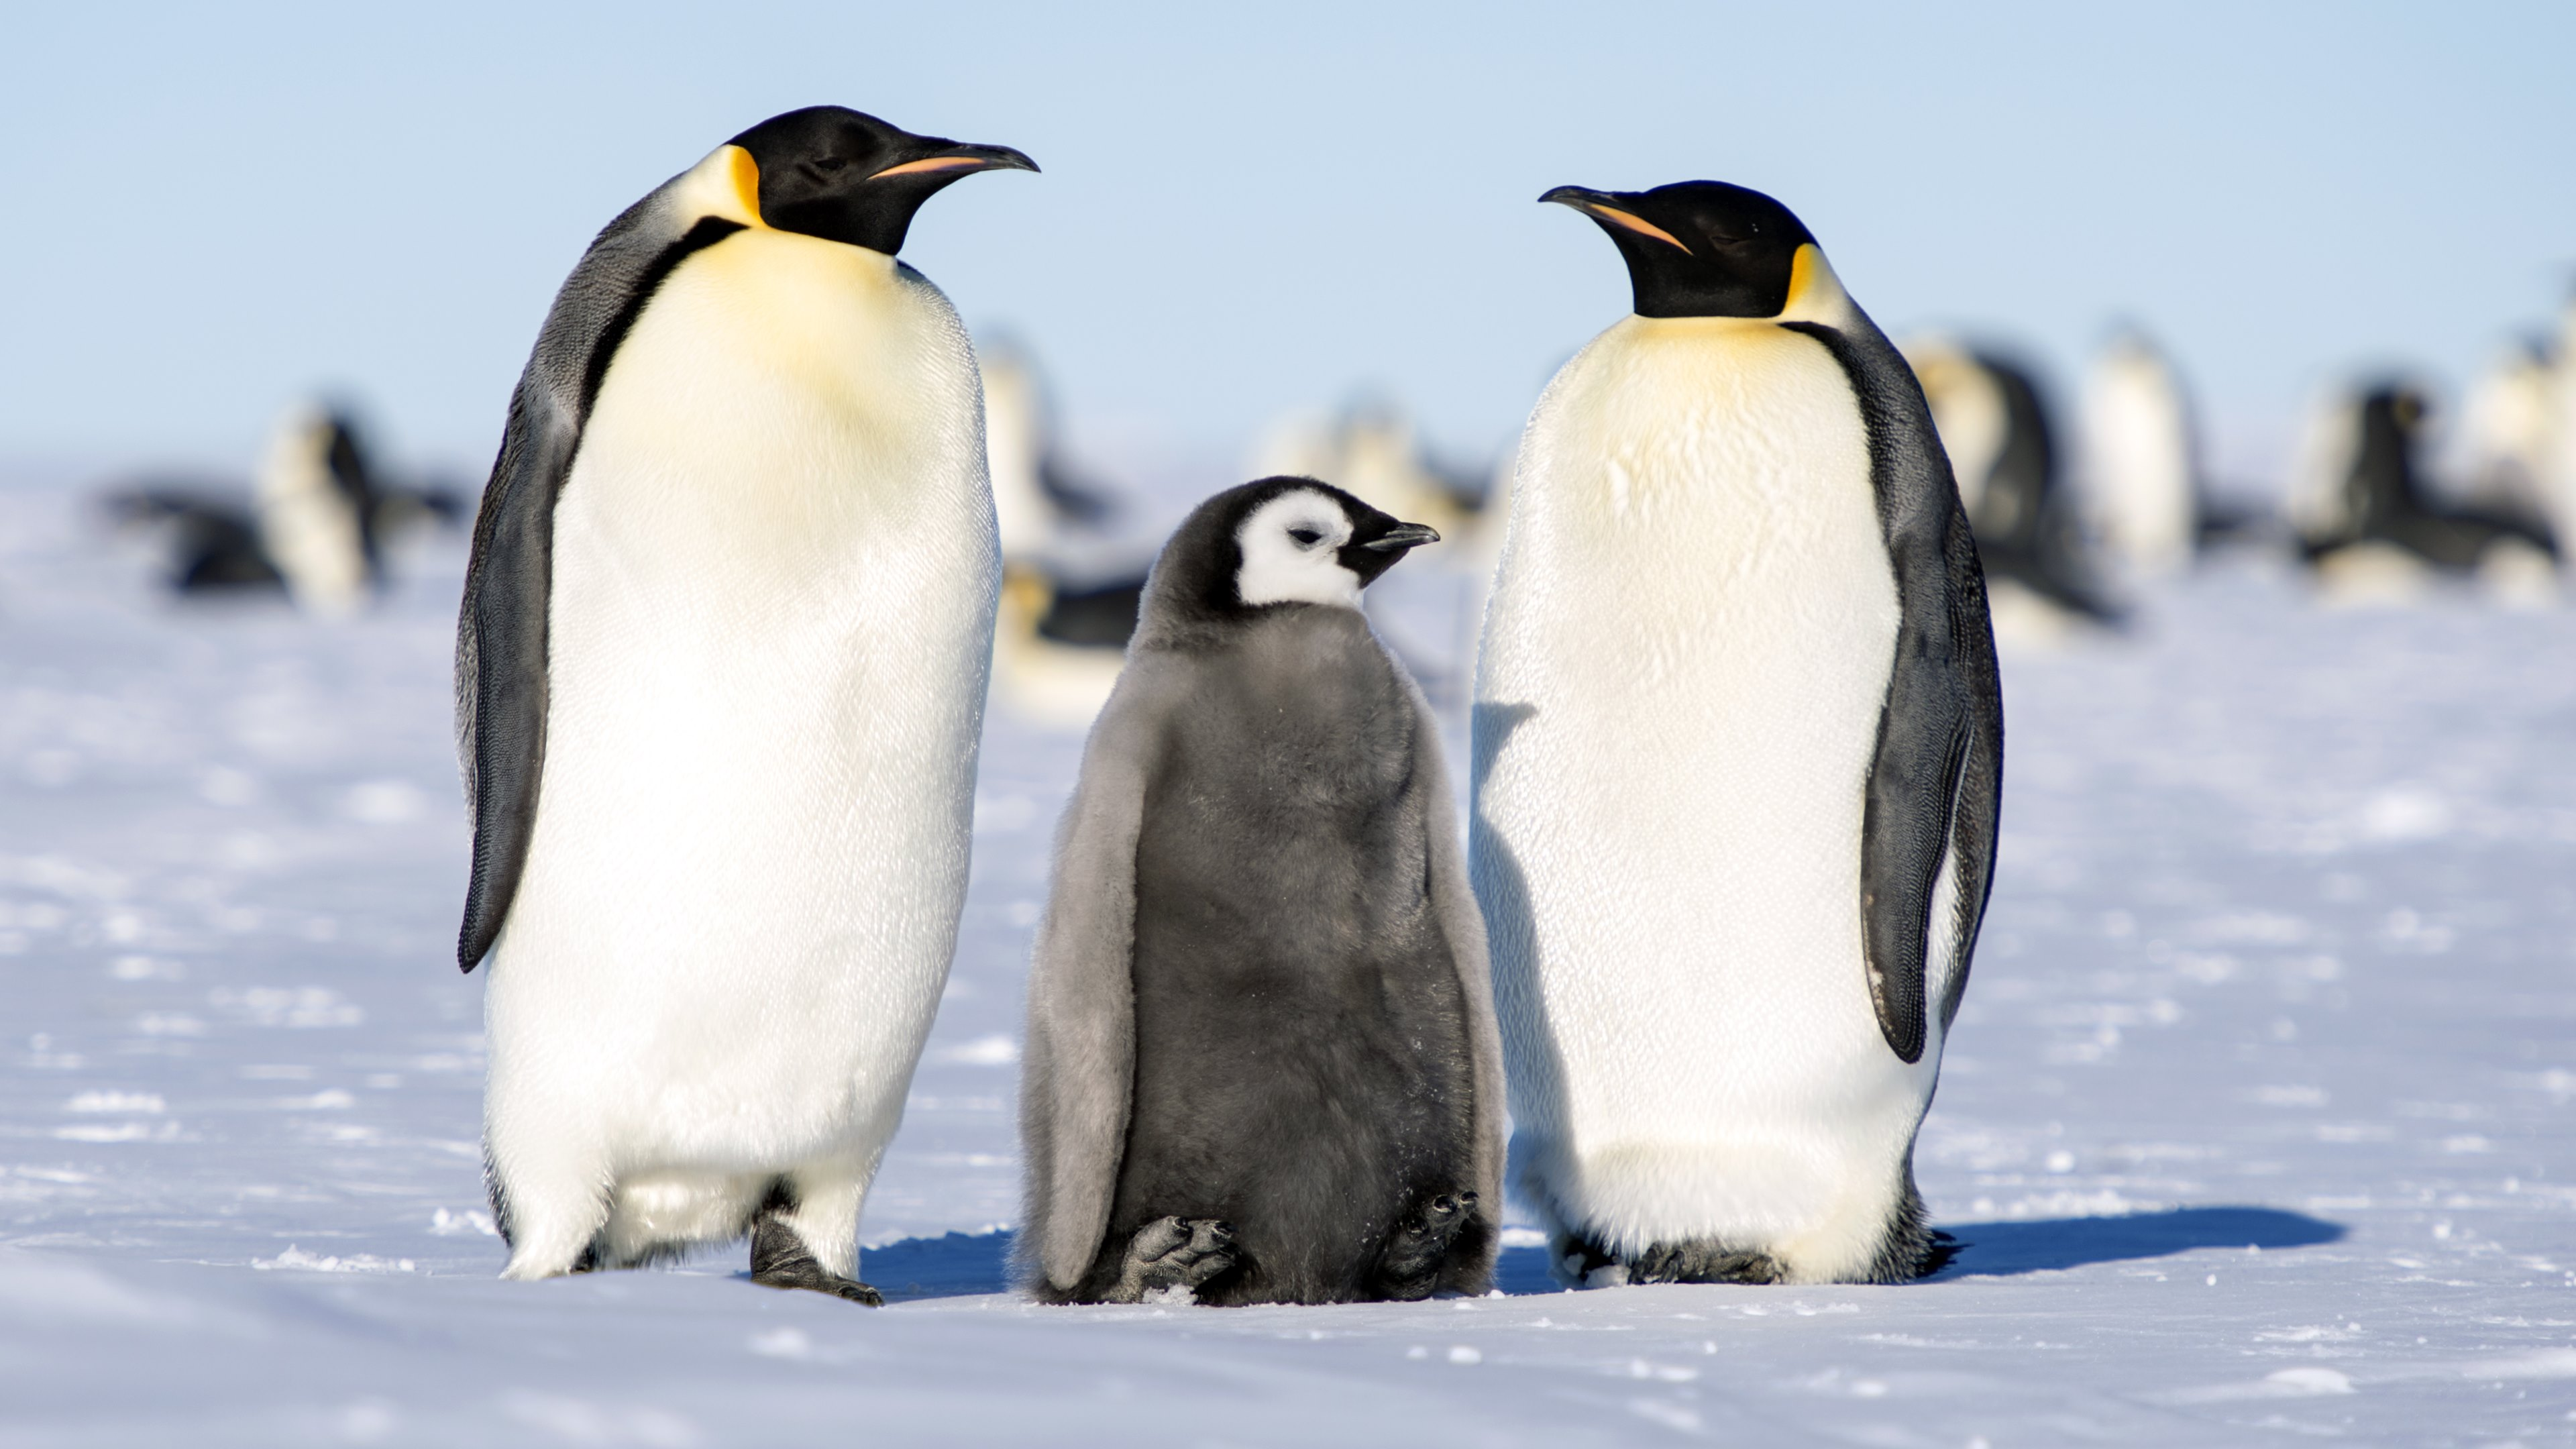 Cute Baby Penguins Wallpaper